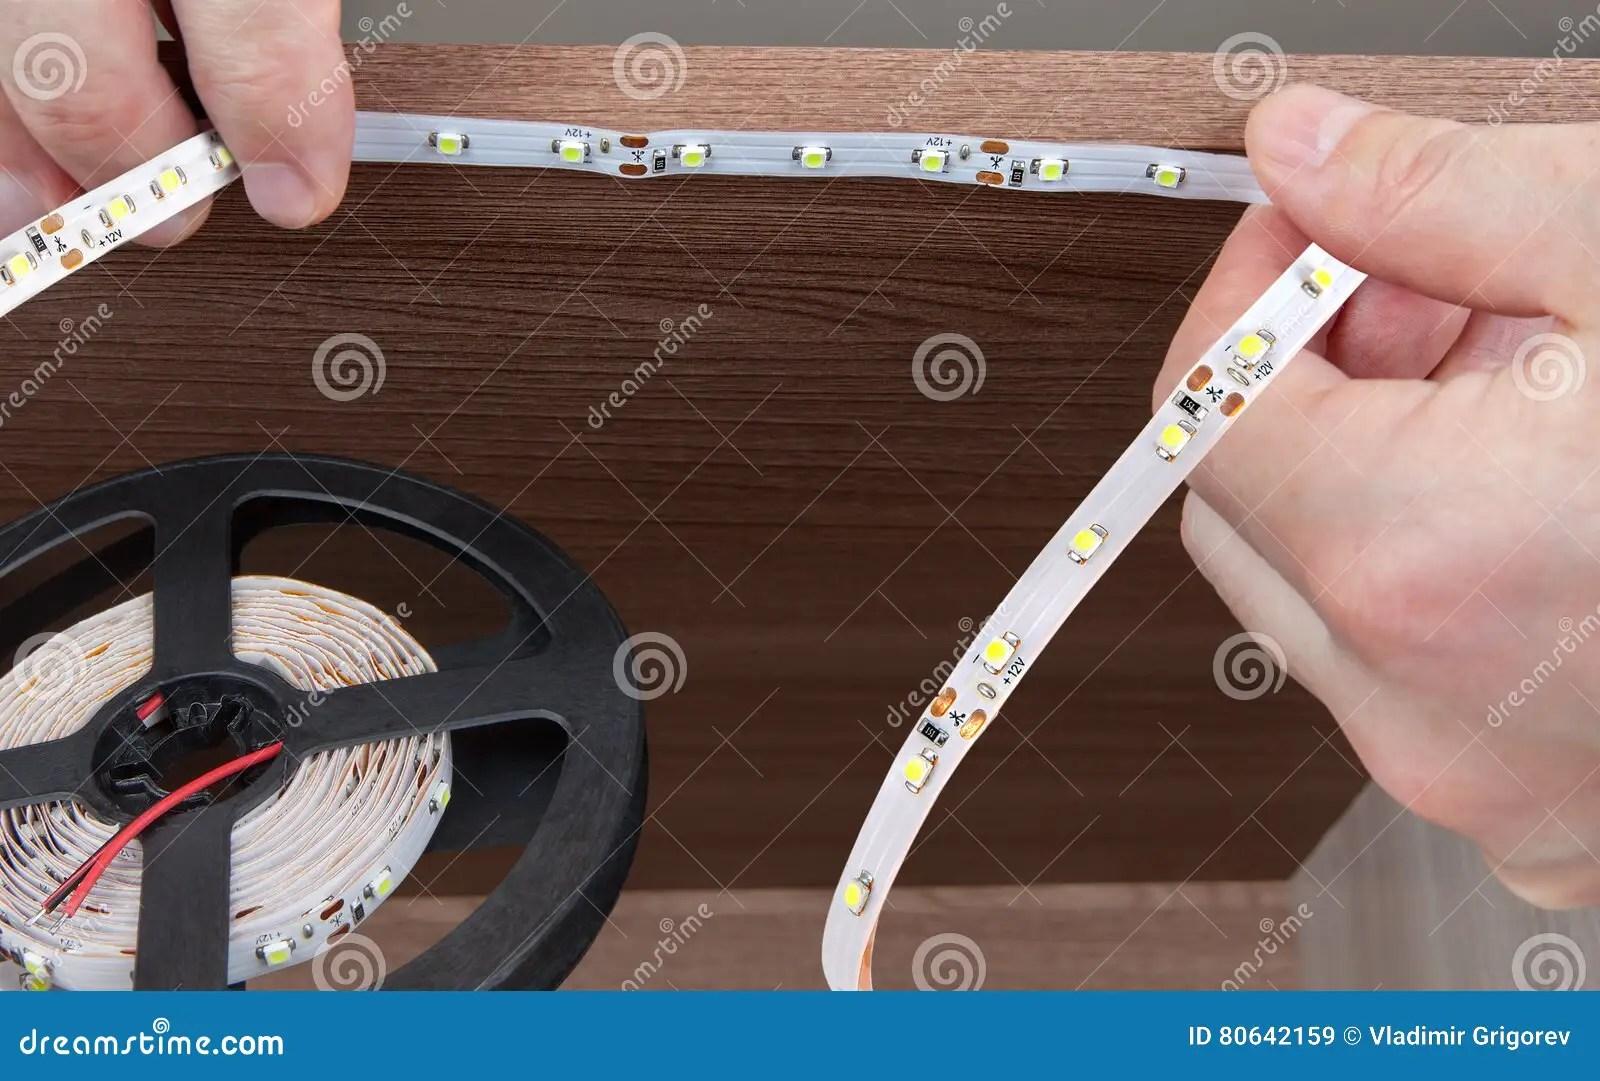 led tape kitchen pantry cabinet freestanding 手杂物工在内阁里面的浆糊led磁带特写镜头库存图片 图片包括有片盘 led照明设备的设施的特写镜头在内阁里面的